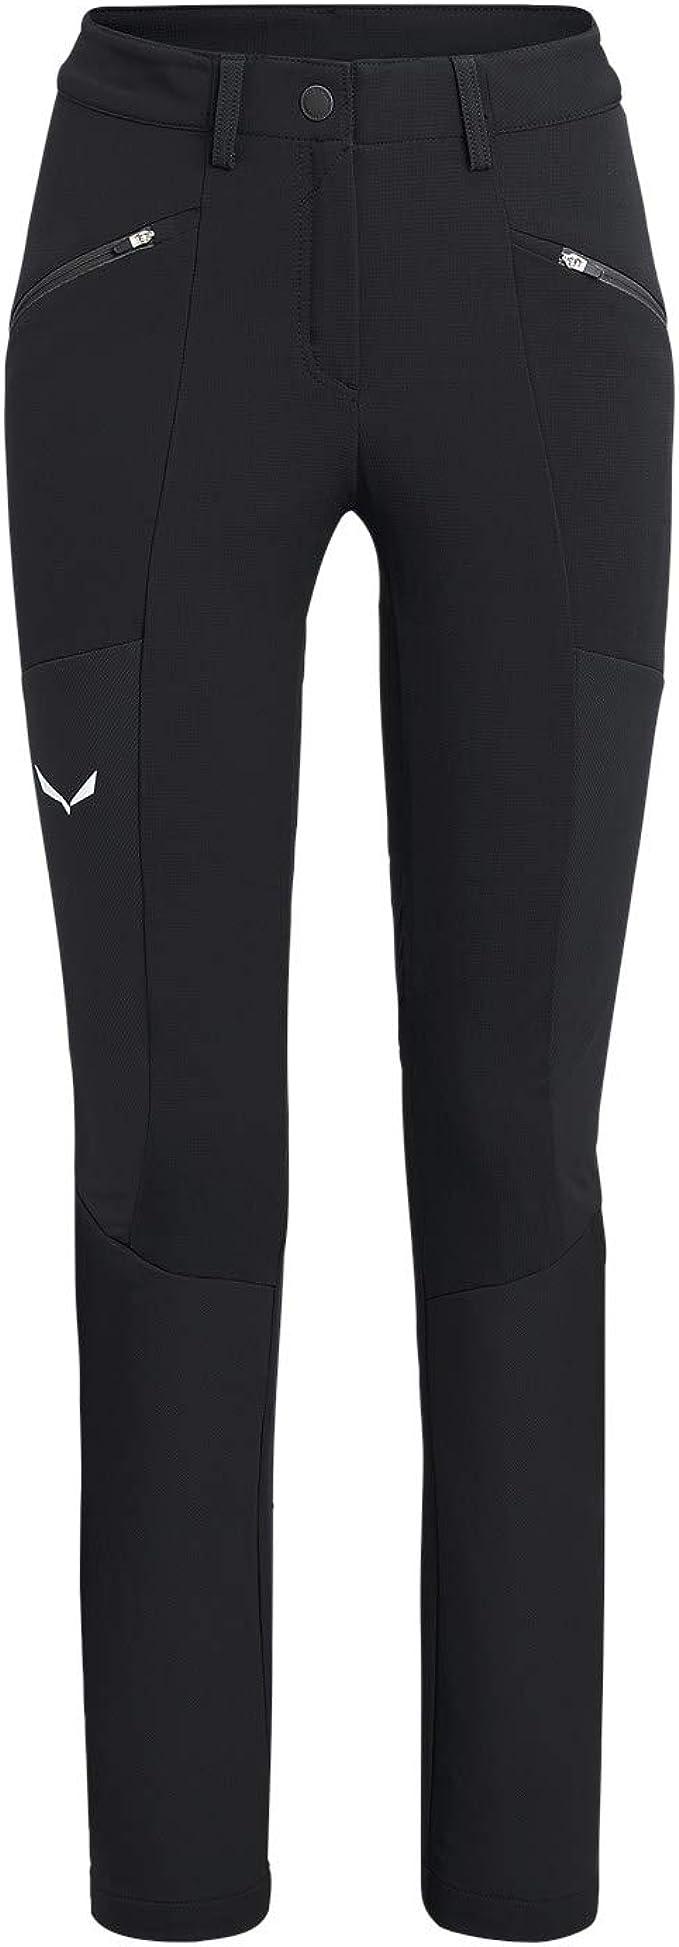 SALEWA - Puez Dst/Wo W, Pantaloni Donna: Amazon.it: Abbigliamento